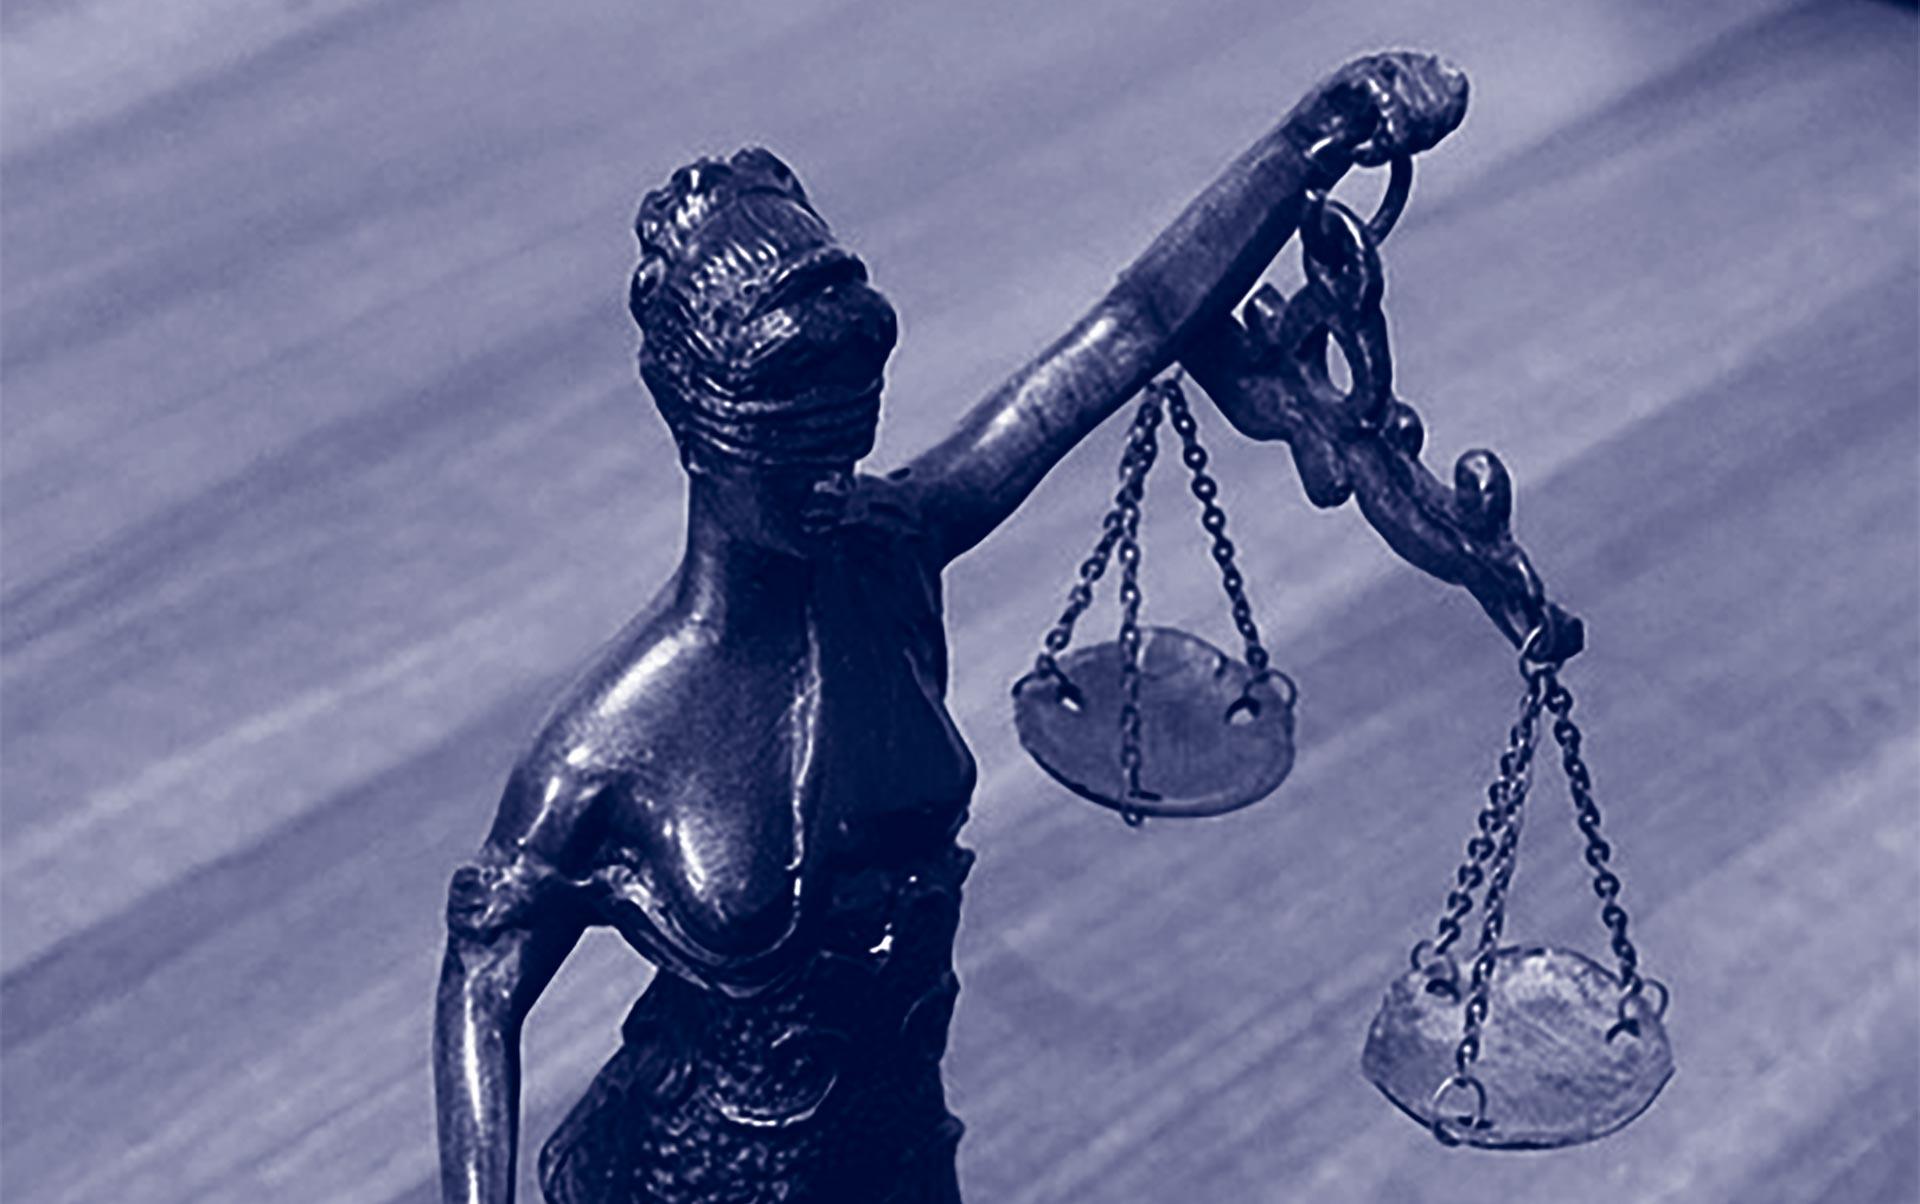 Wie is verkoper in geval van bemiddeling?